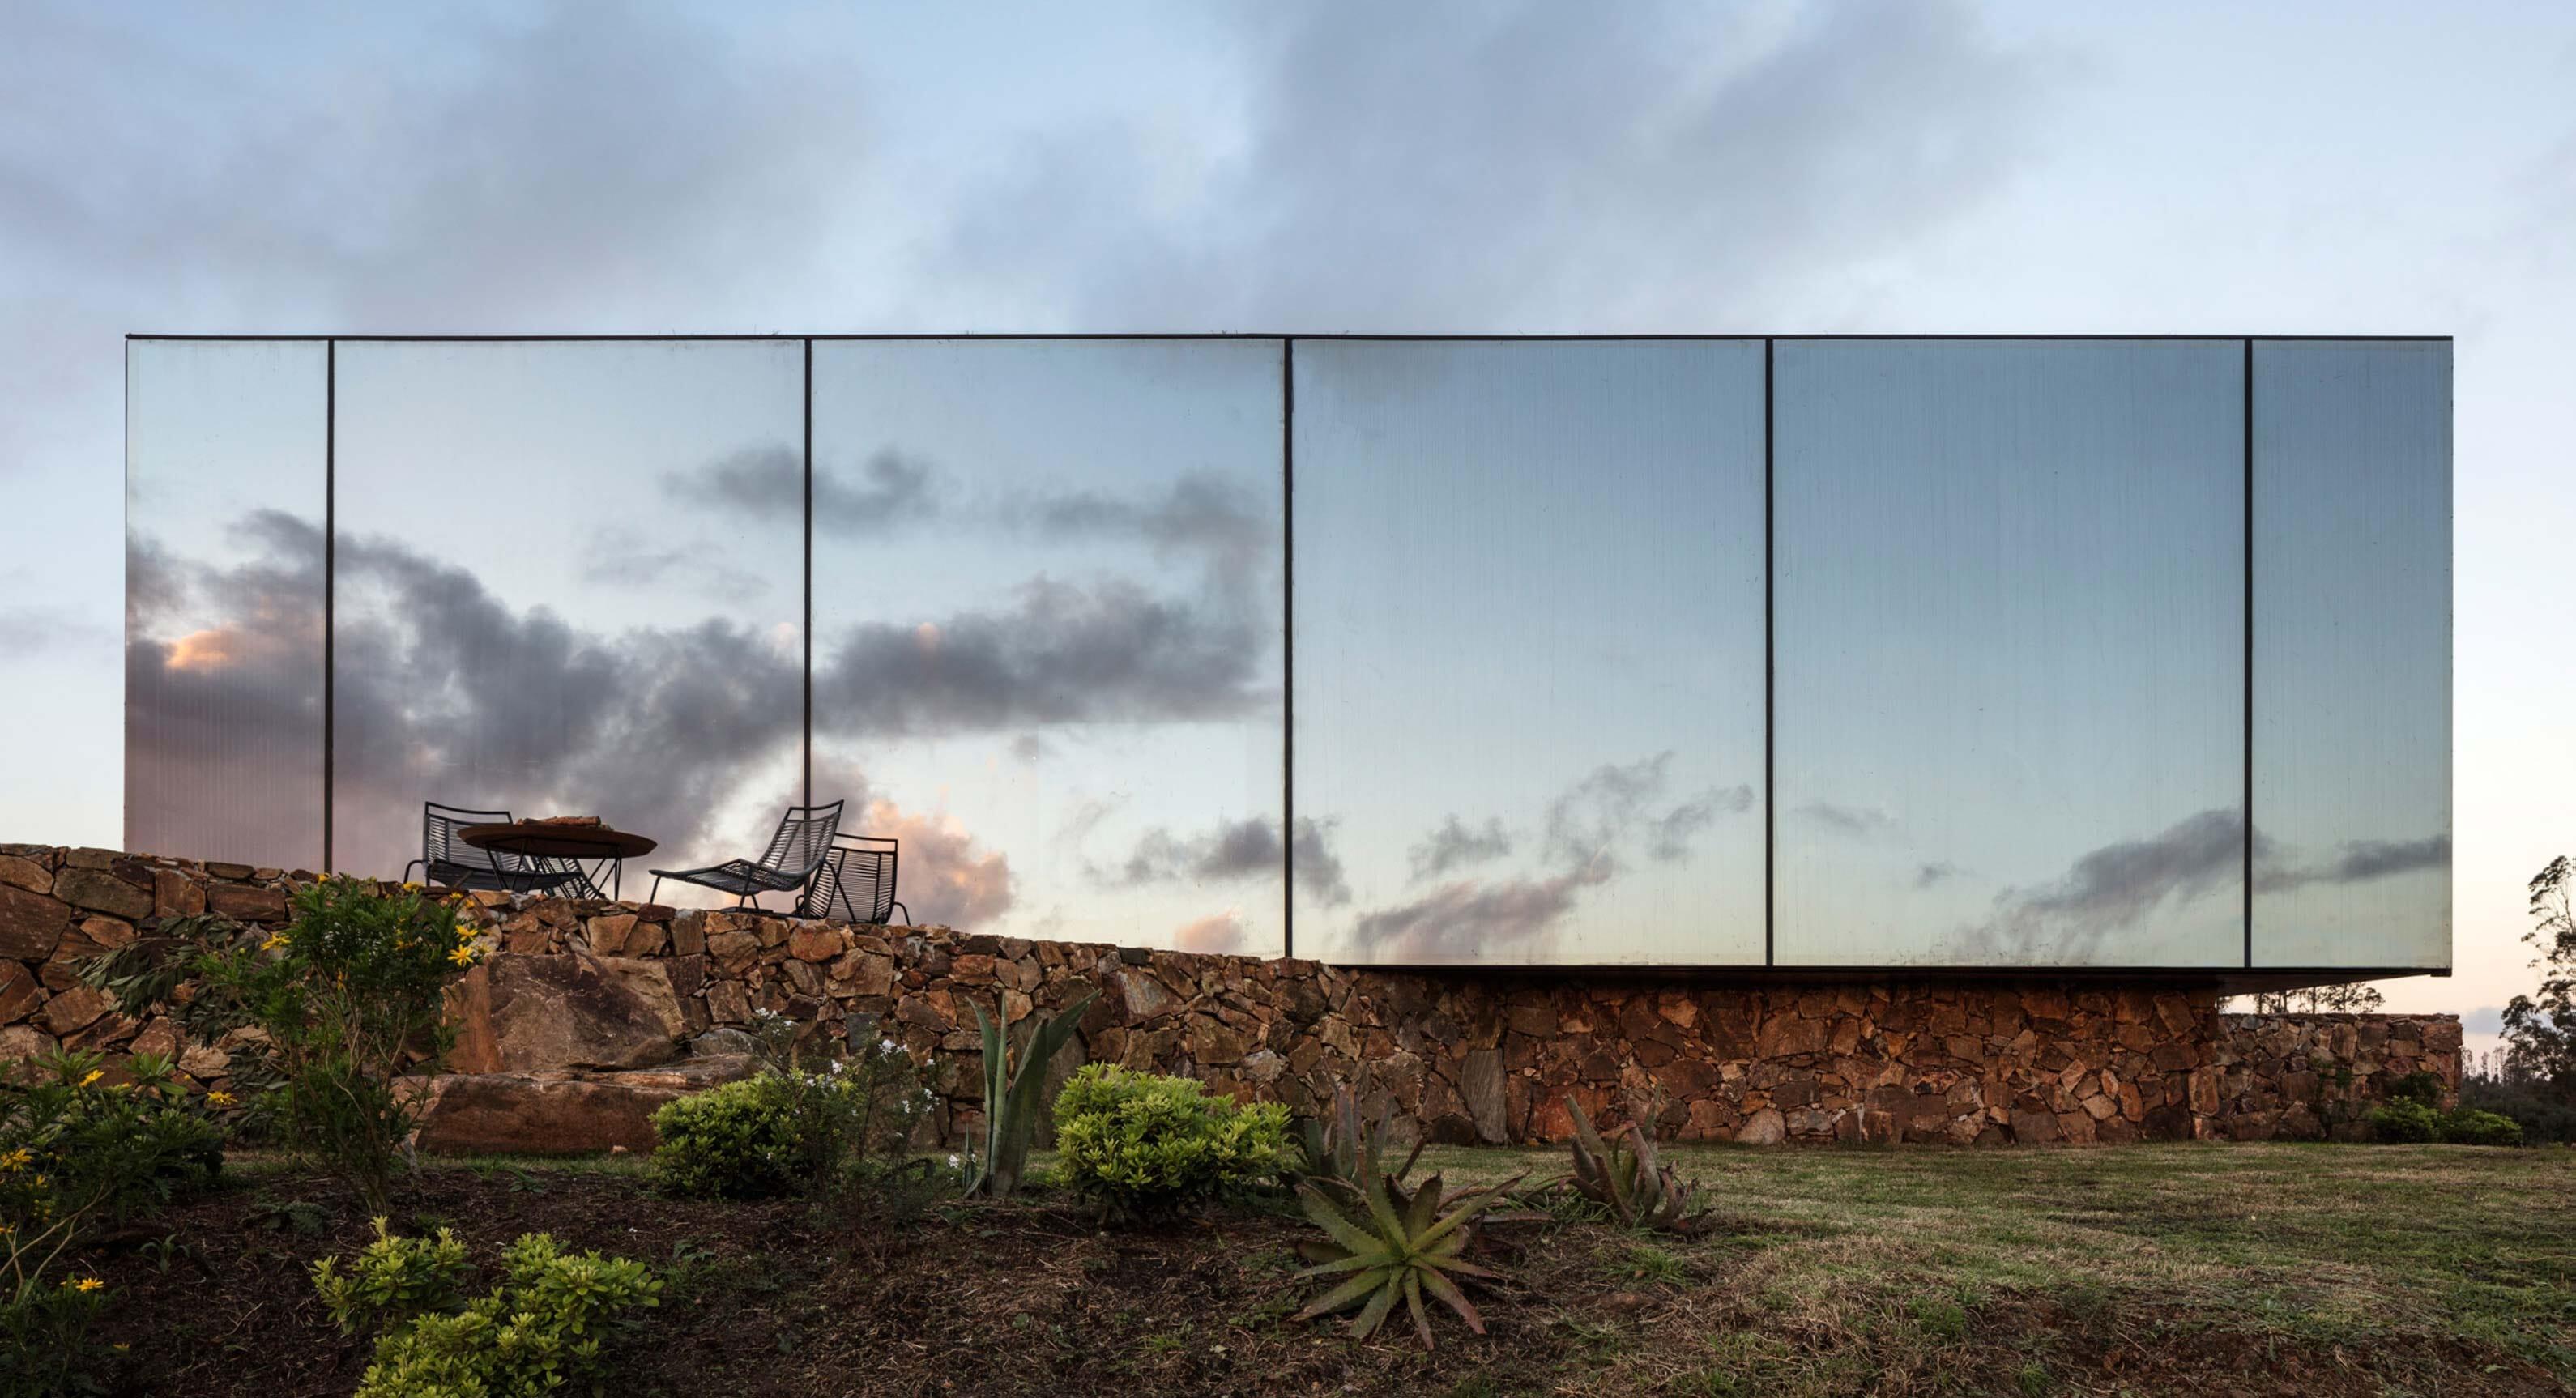 The Sacromonte Landscape Hotel Mirrors Its Idyllic Vineyard Setting